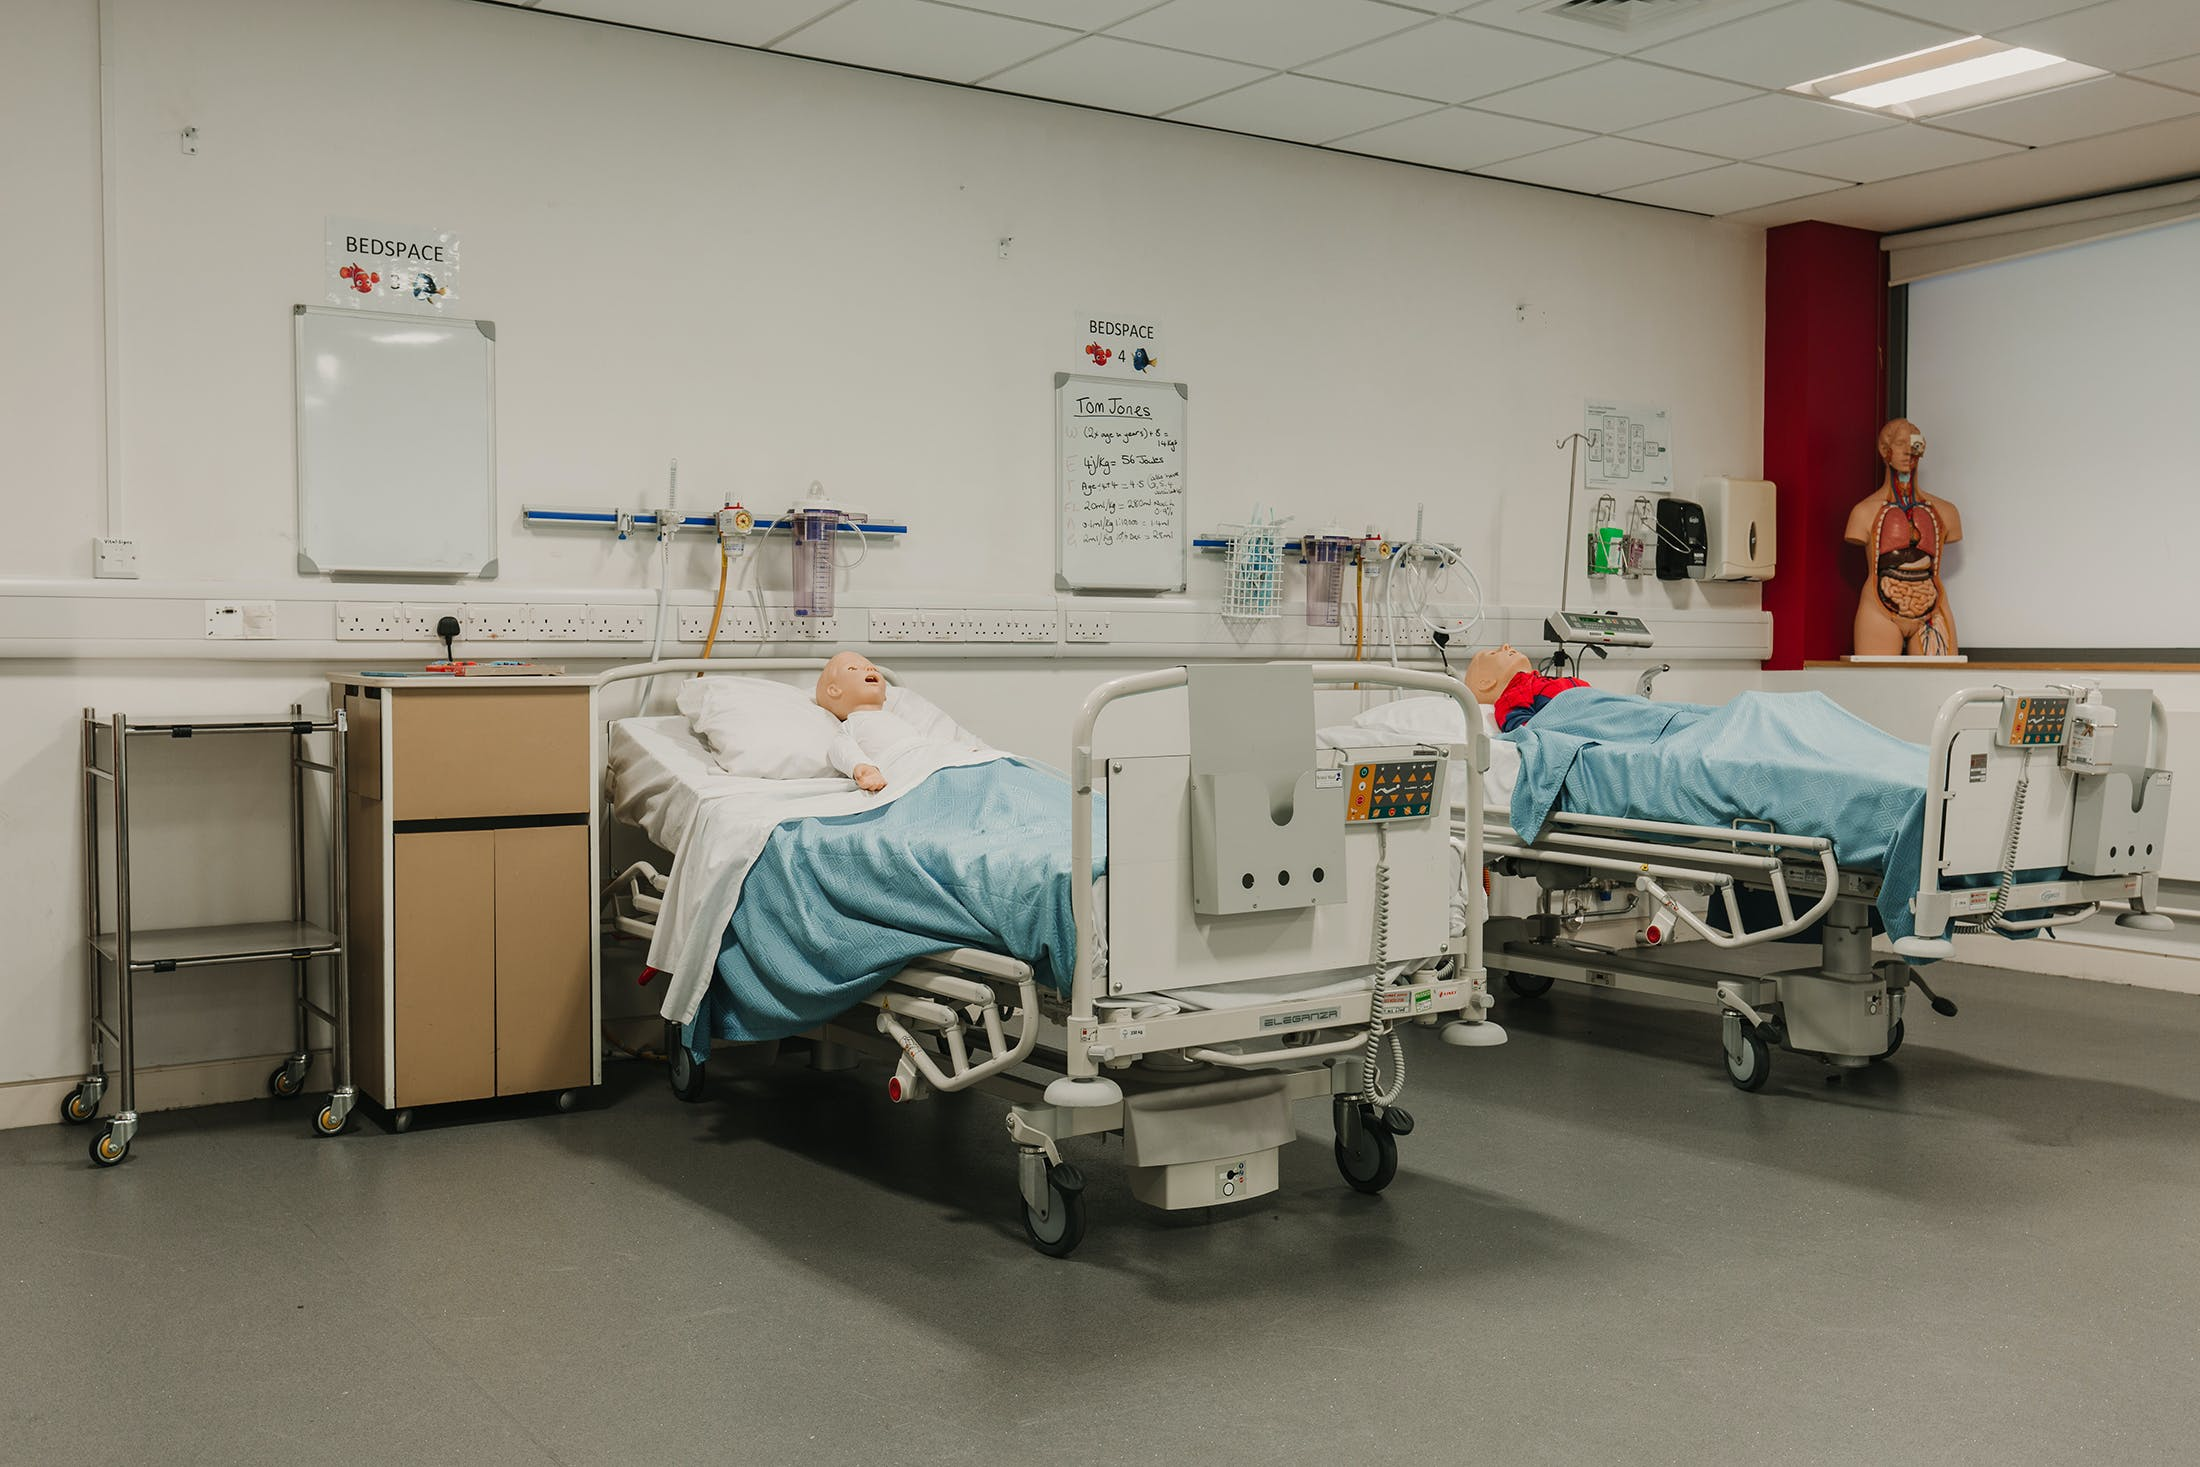 Nursing and Midwifery facilities - 2 child ward